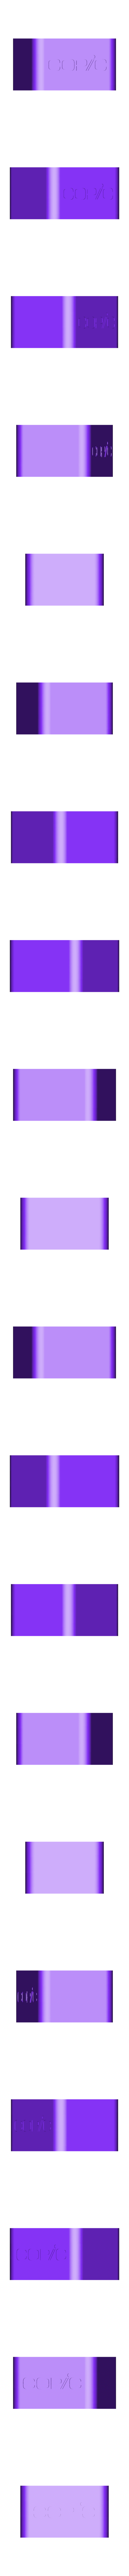 D20a67dc 18c2 4cbd b3e3 34b7fb29b128